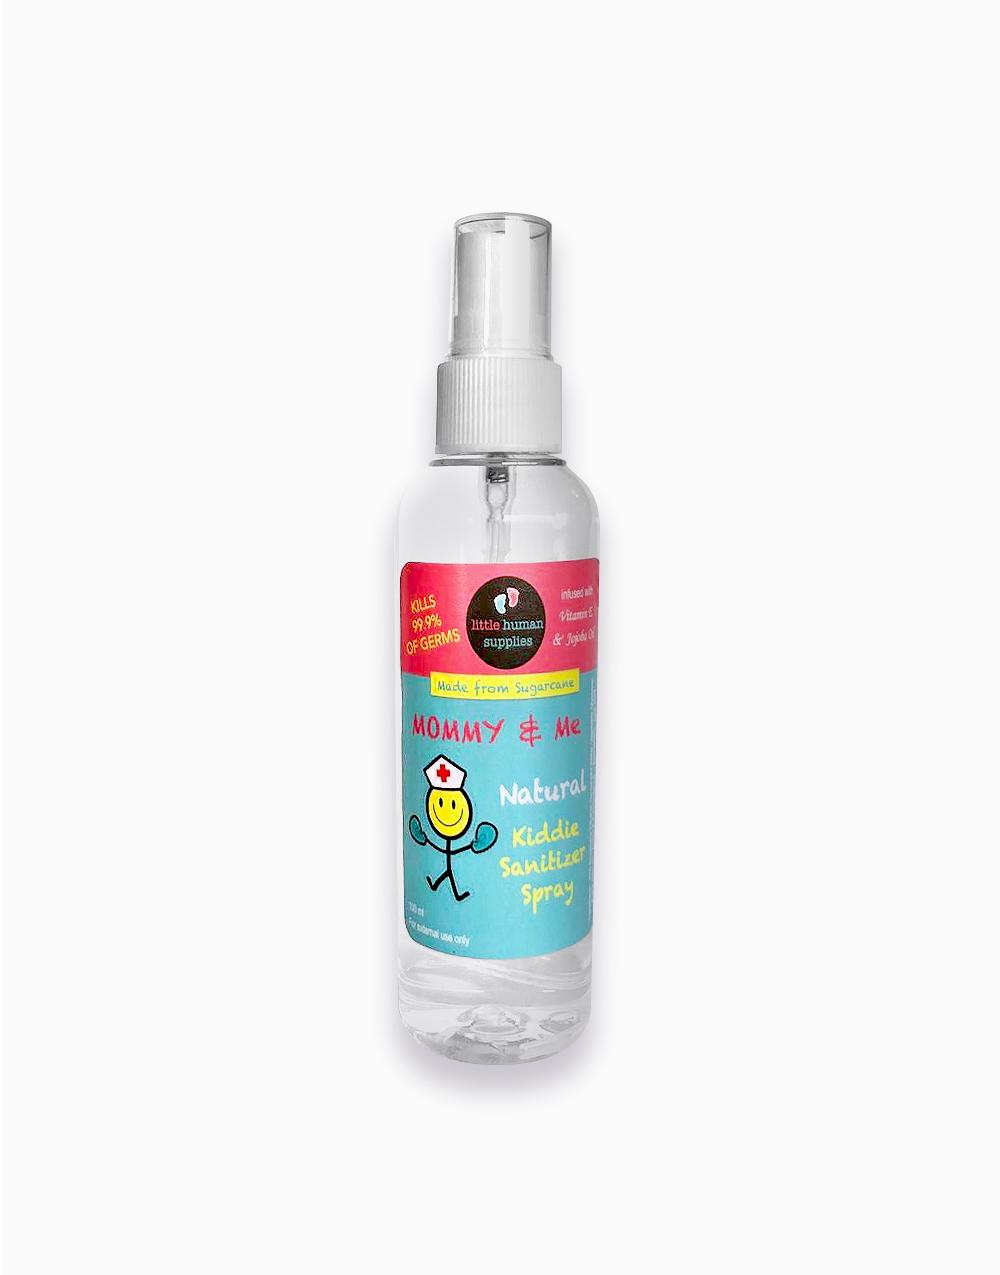 Natural Kiddie Sanitizer Spray with Vitamin E & Jojoba (100 ml) by Little Human Supplies